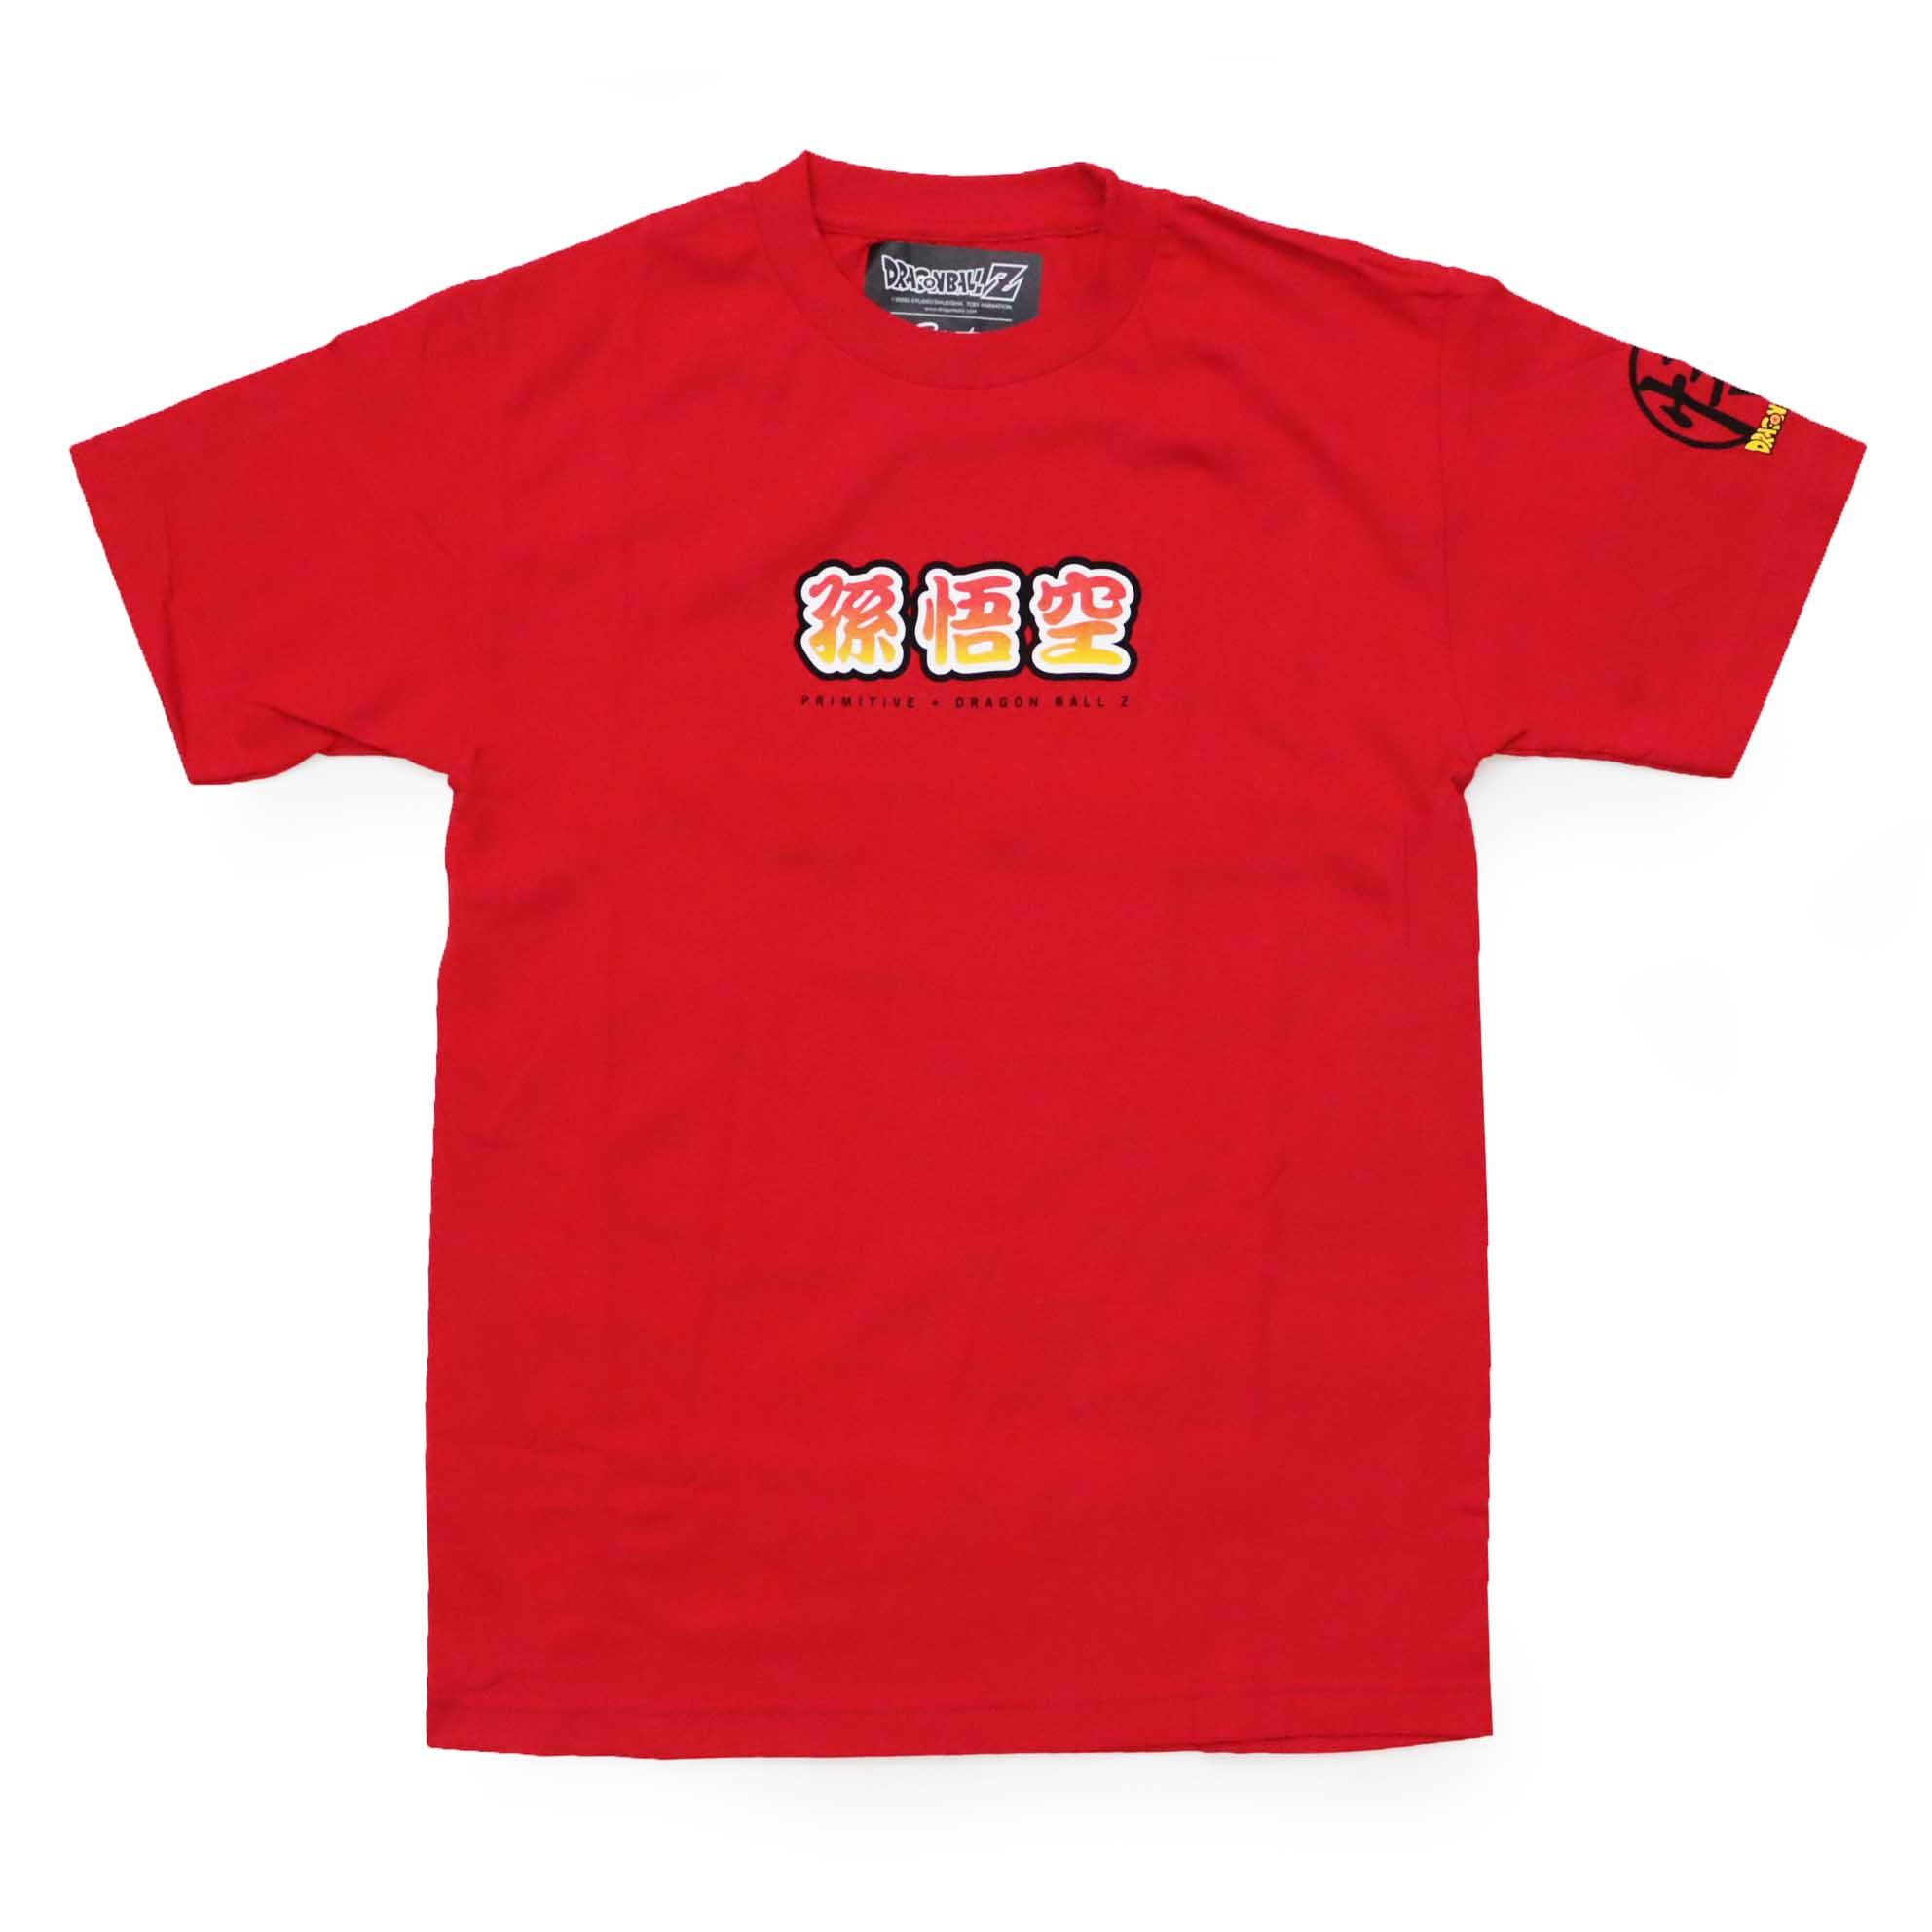 Camiseta Primitive x Dragon Ball Saiyan Style - Vermelho (Importado)